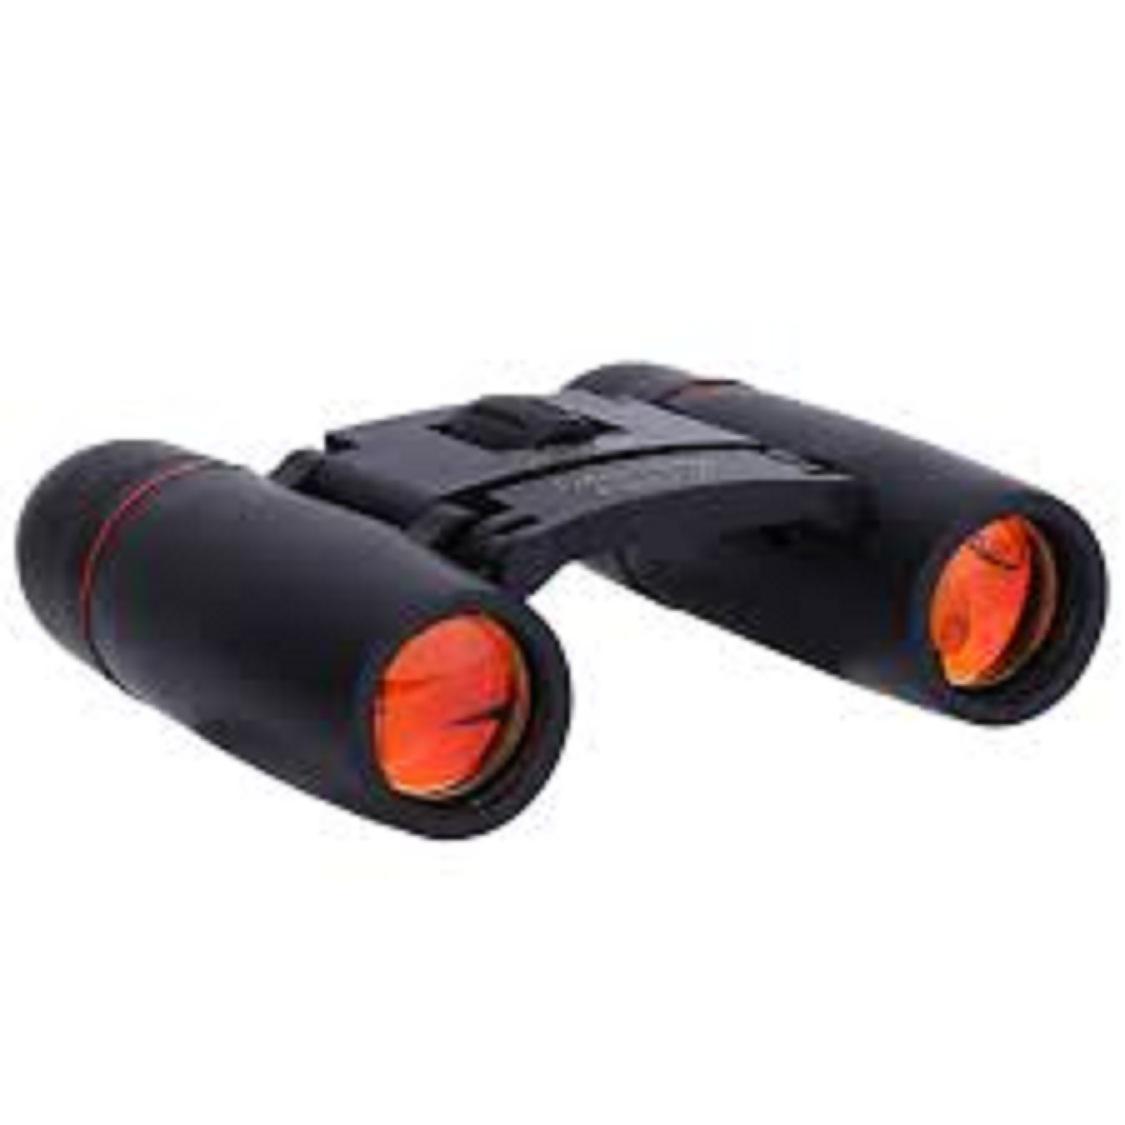 Binocular Small